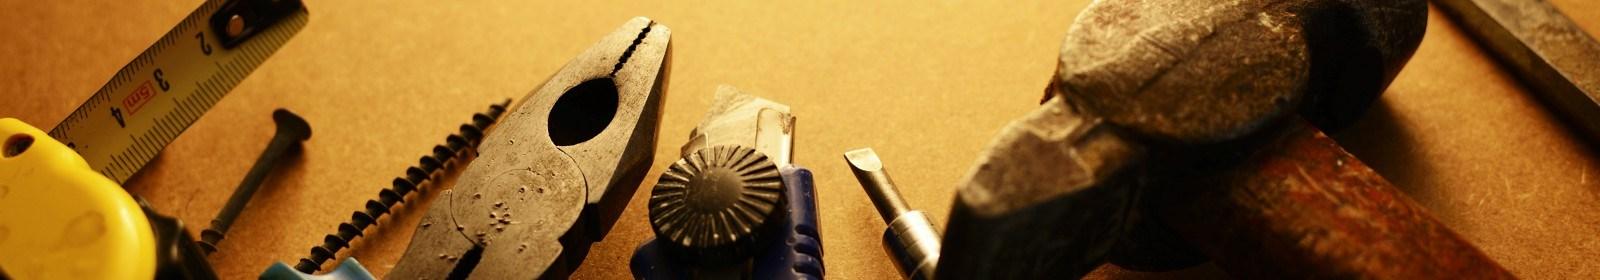 Your home maintenance checklist